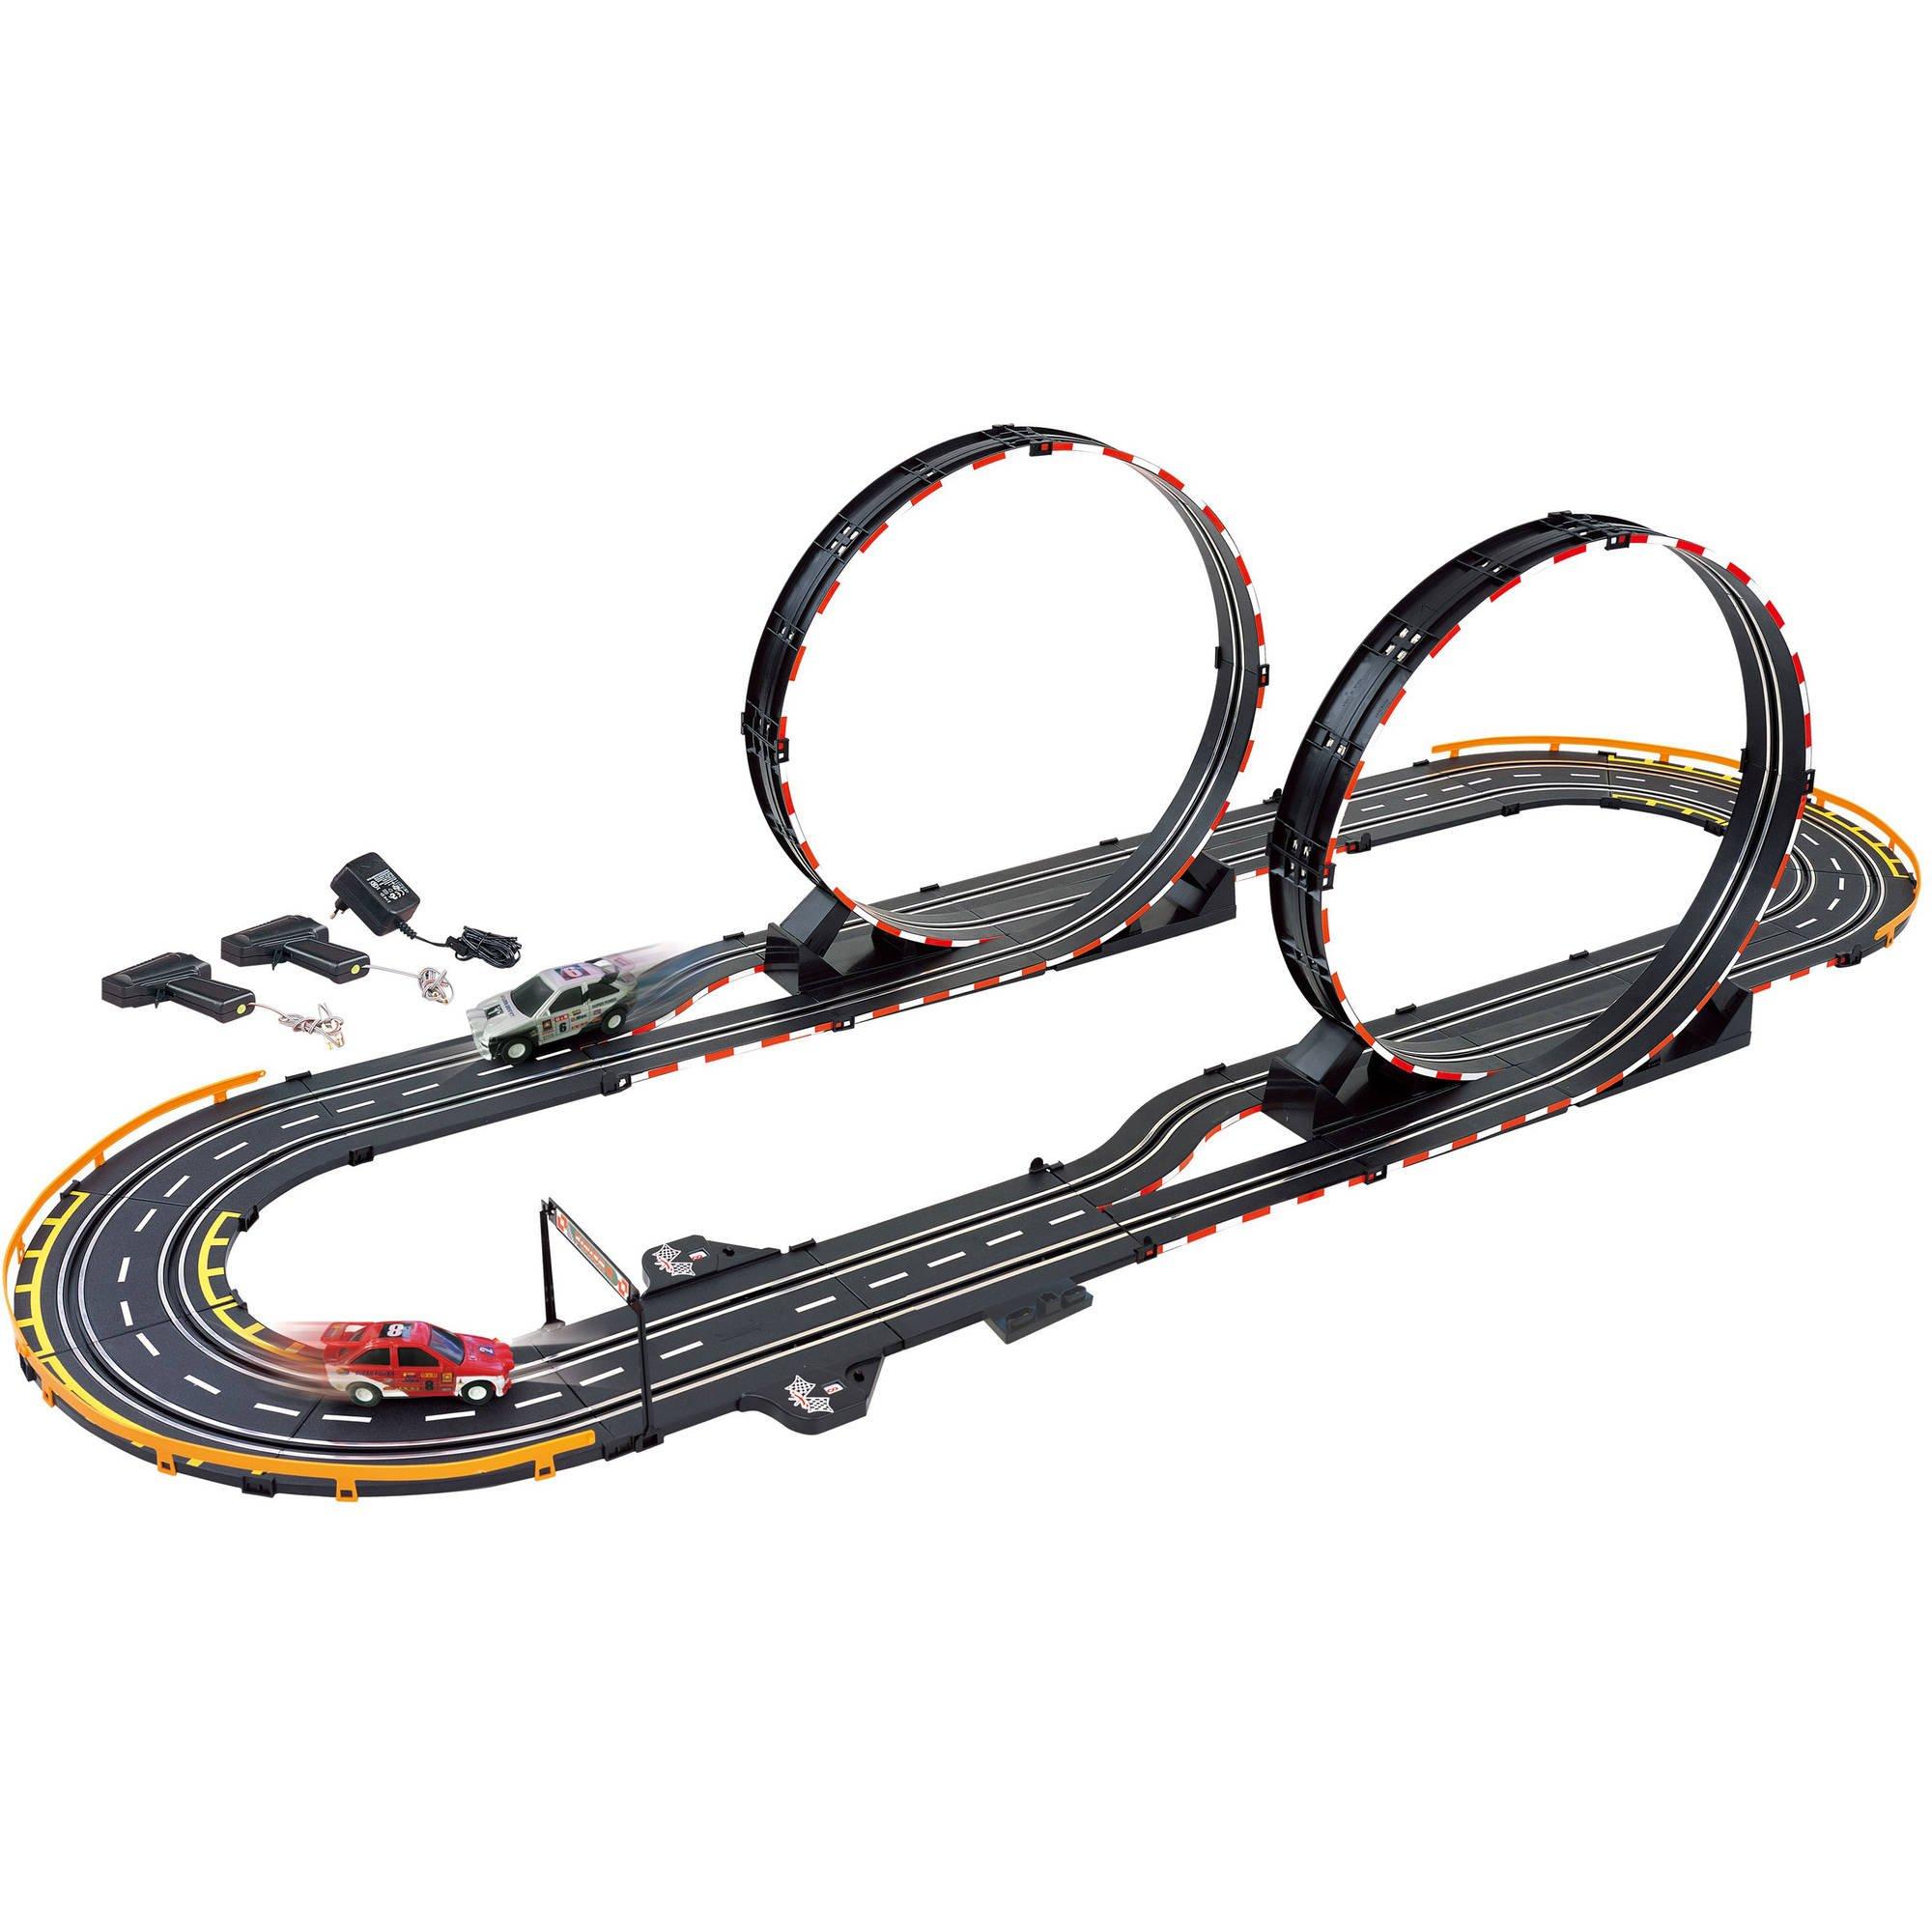 GB Pacific 66511 Parallel Looping Electric Power Road Racing Set, Black